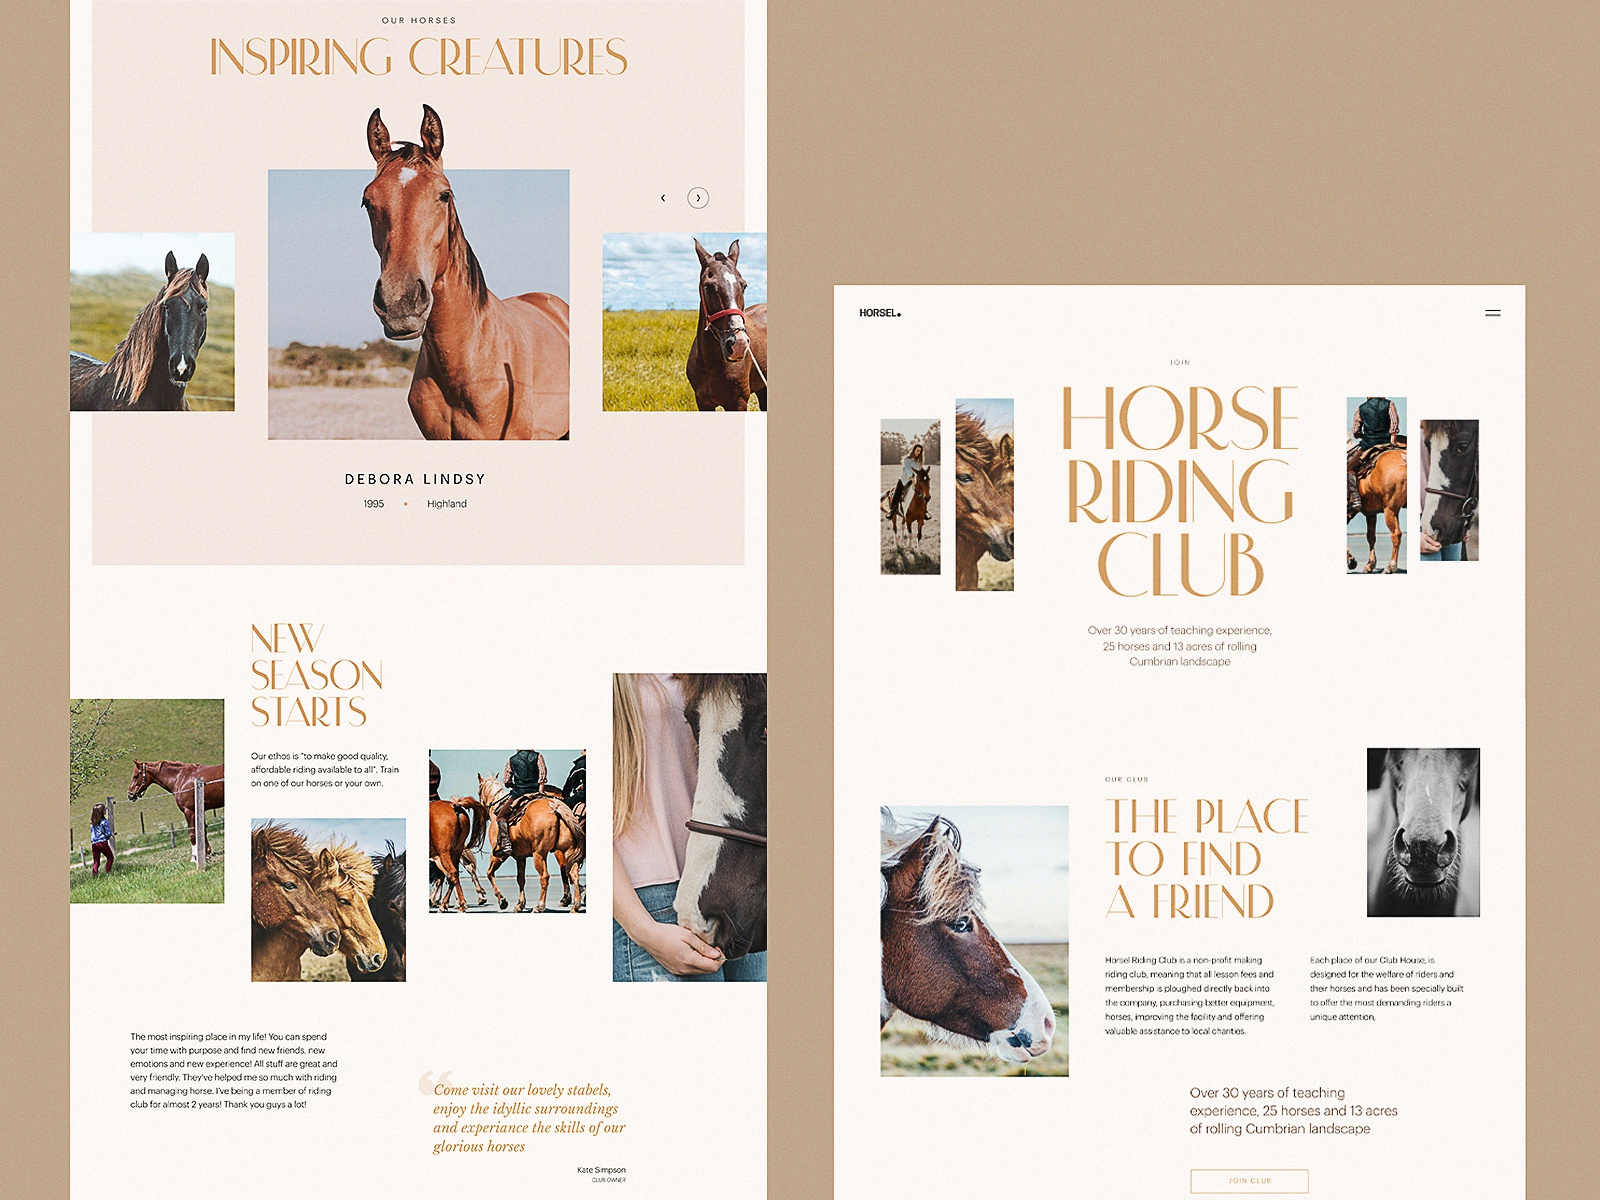 Horse Riding Club Website Design by tubik